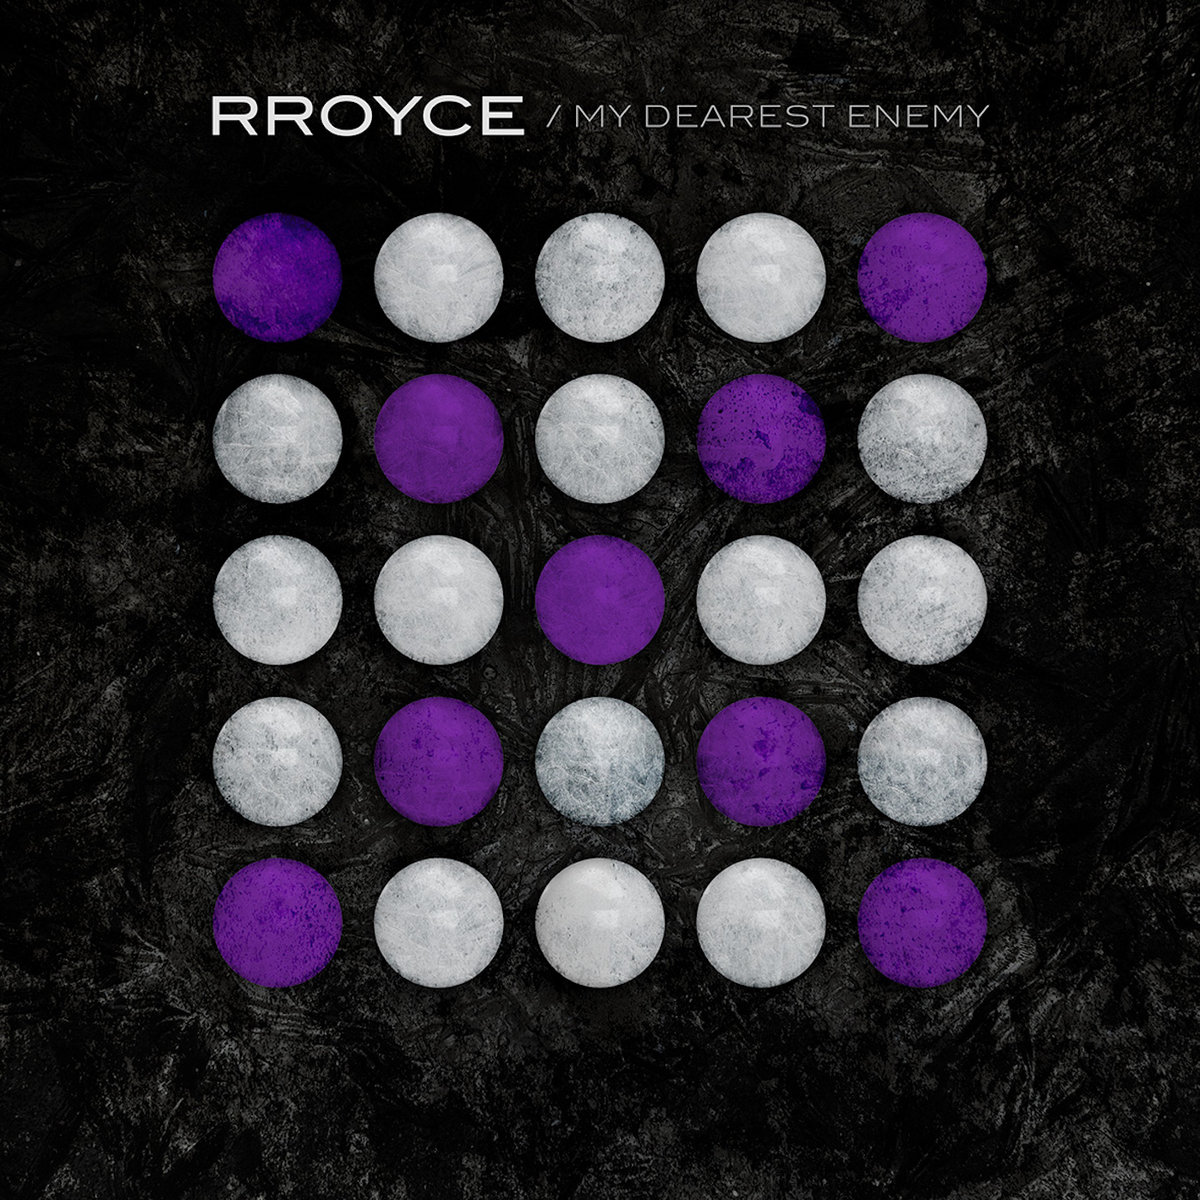 Rroyce - My Dearest Enemy - Rroyce - My Dearest Enemy